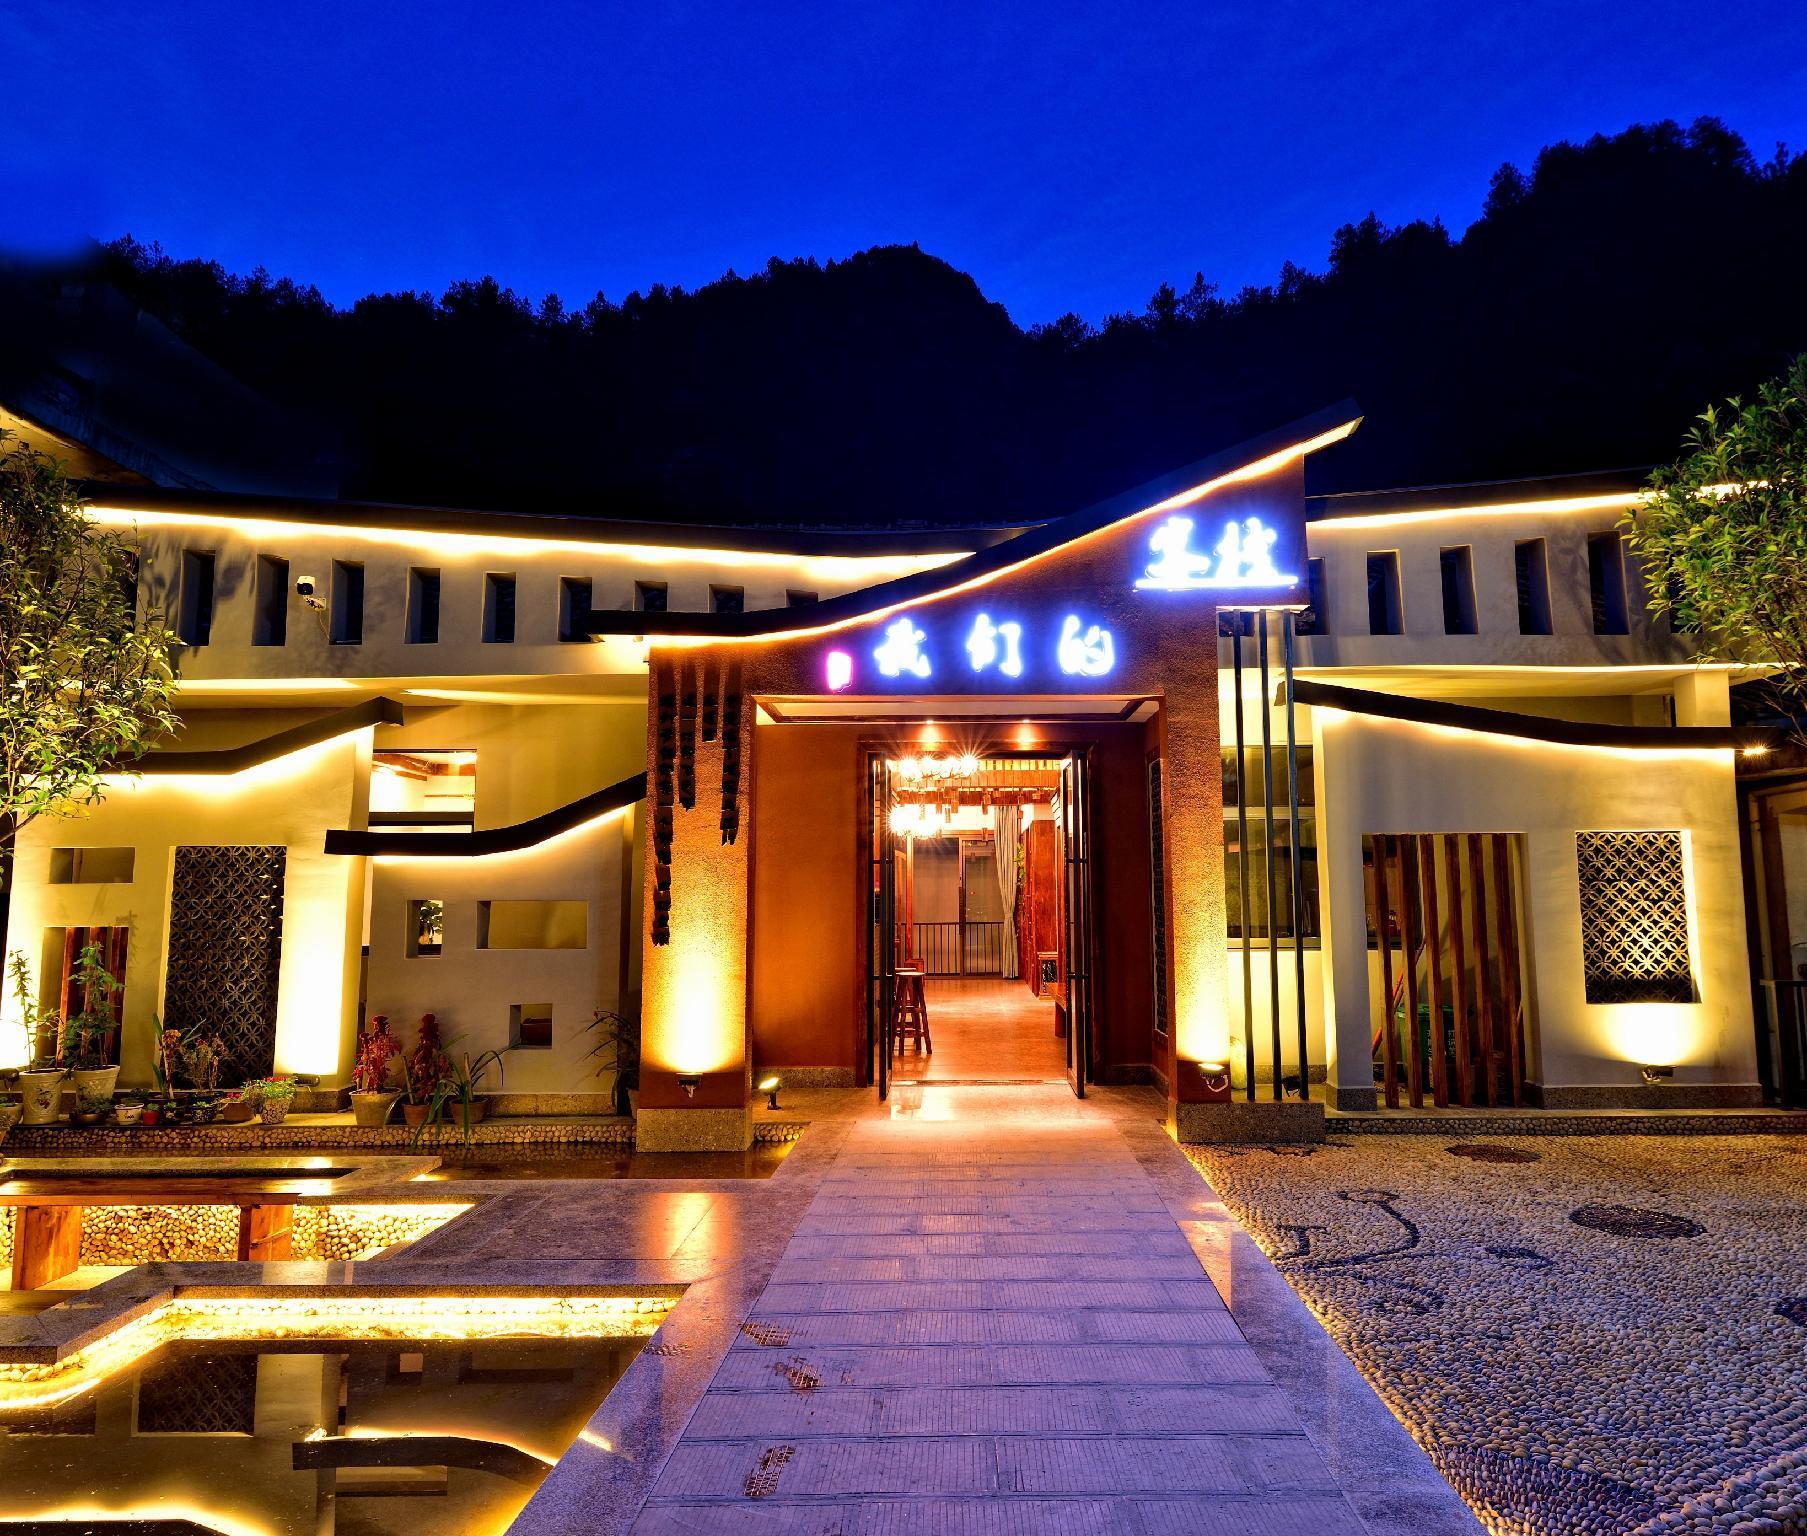 Zhangjiajie National Forest Park * Tujia Special